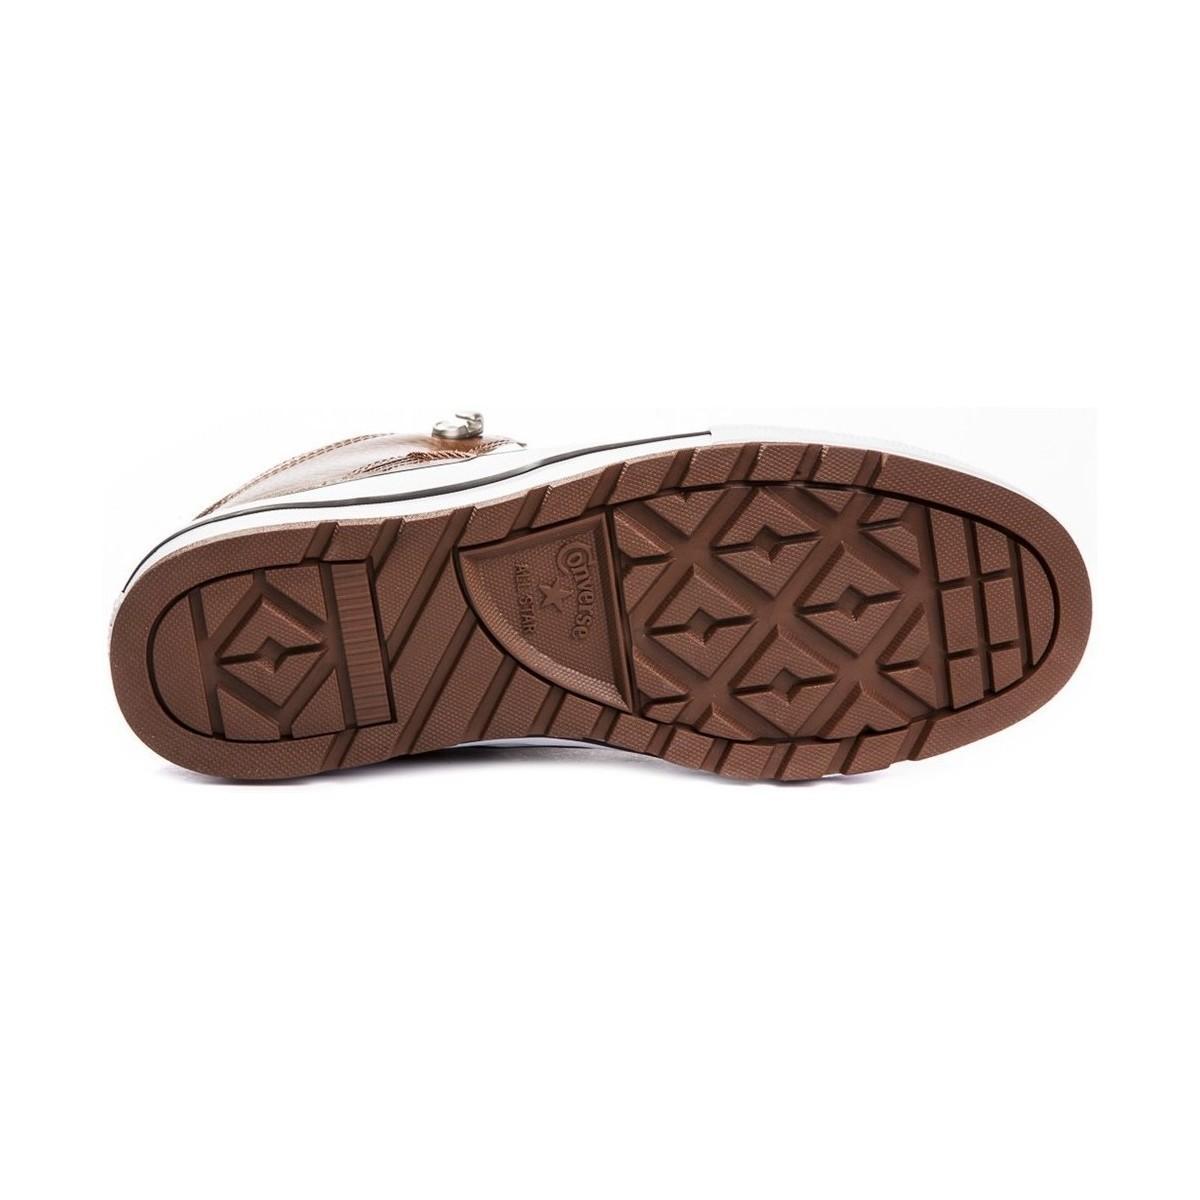 b4c30a825792 Converse Chuck Taylor All Star Street Boot Men s Shoes (high-top ...